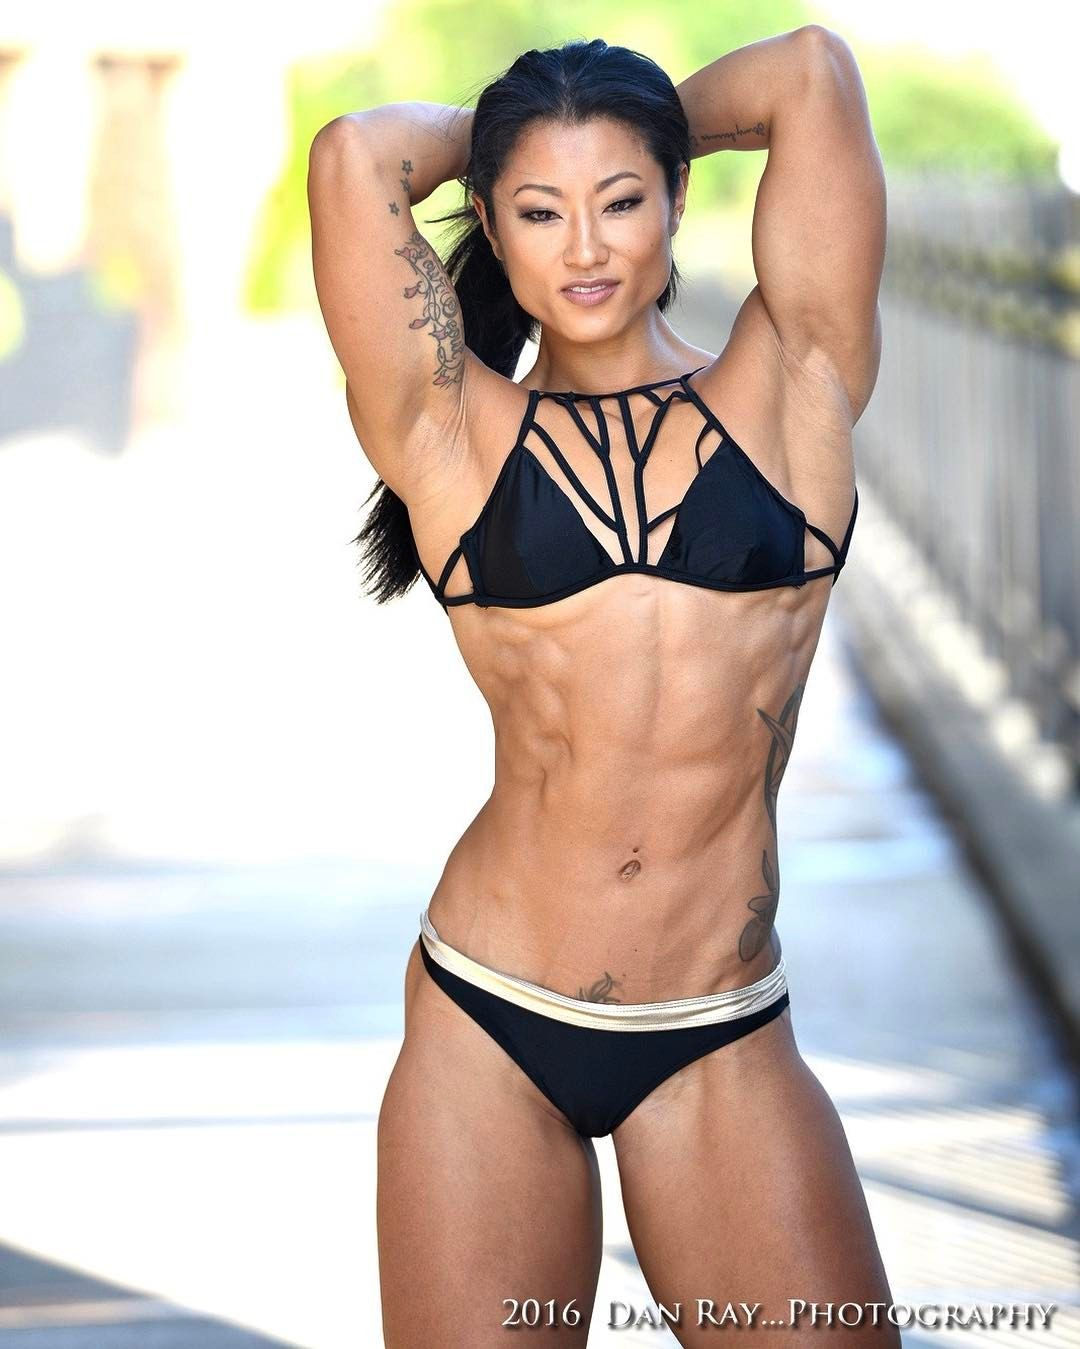 Sexy muscle women in bikinis